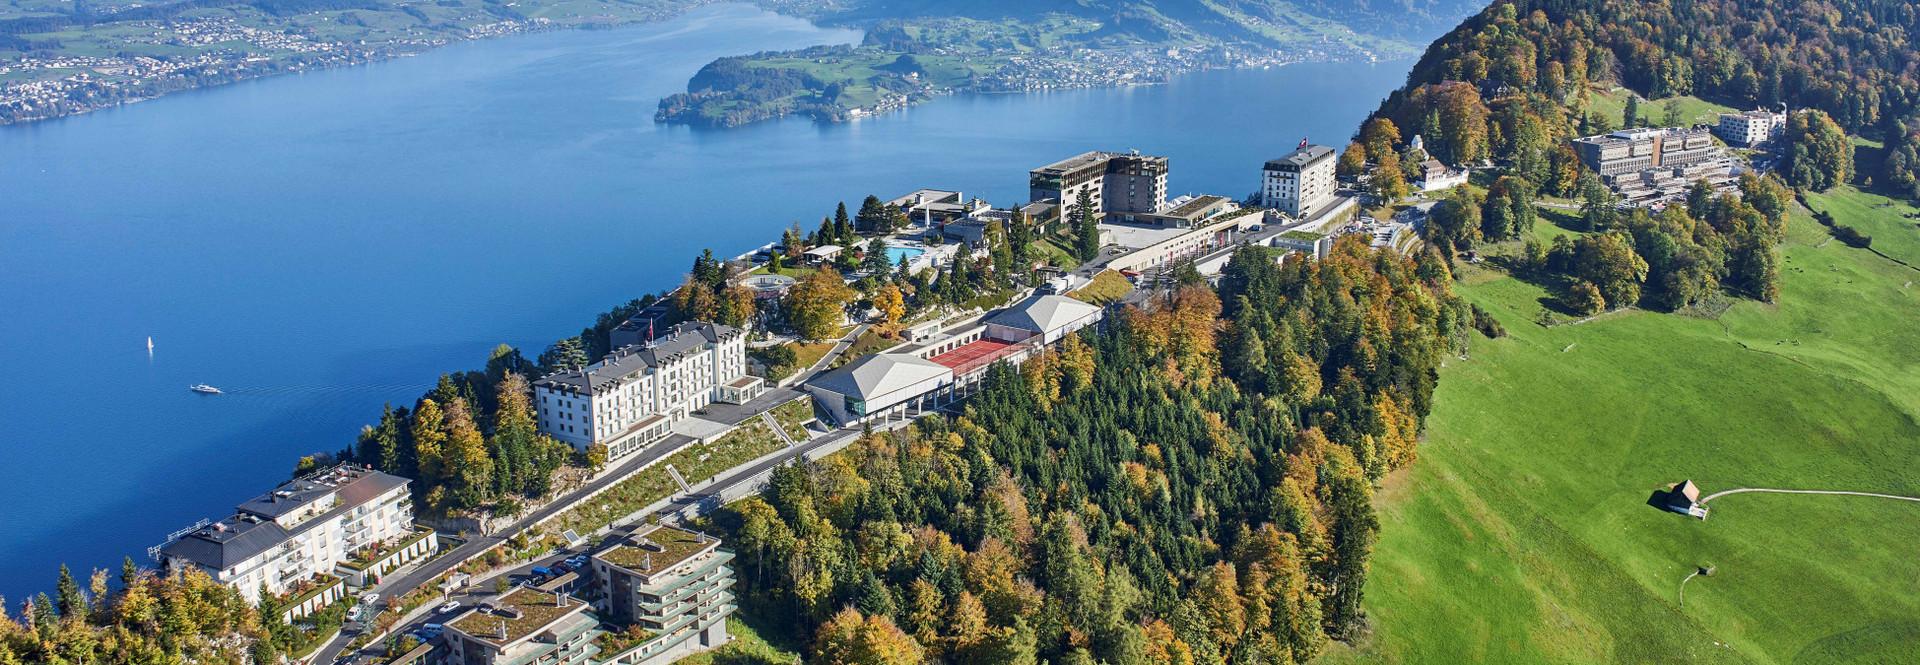 Resort Bürgenstock et lac des Quatre-Cantons